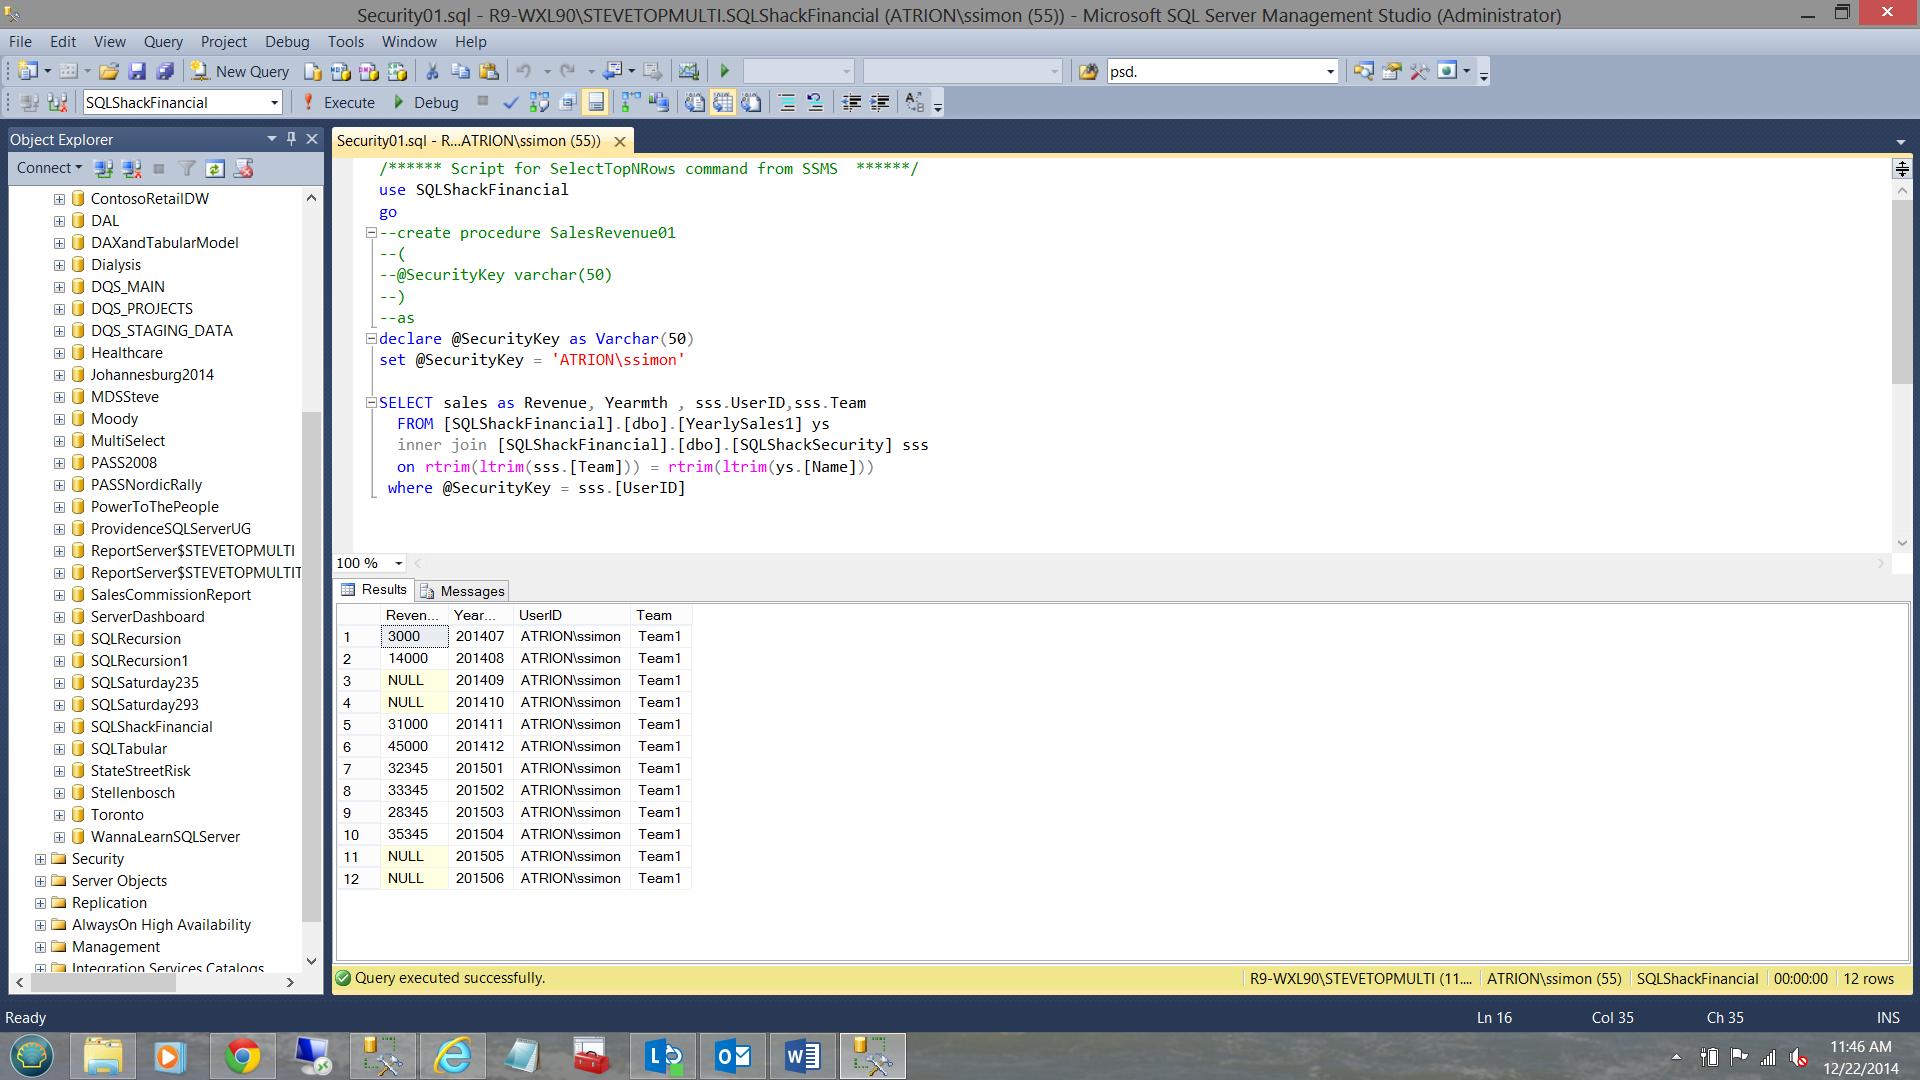 SQL Server安全机制–如何控制用户能够在报告中查看哪些数据5